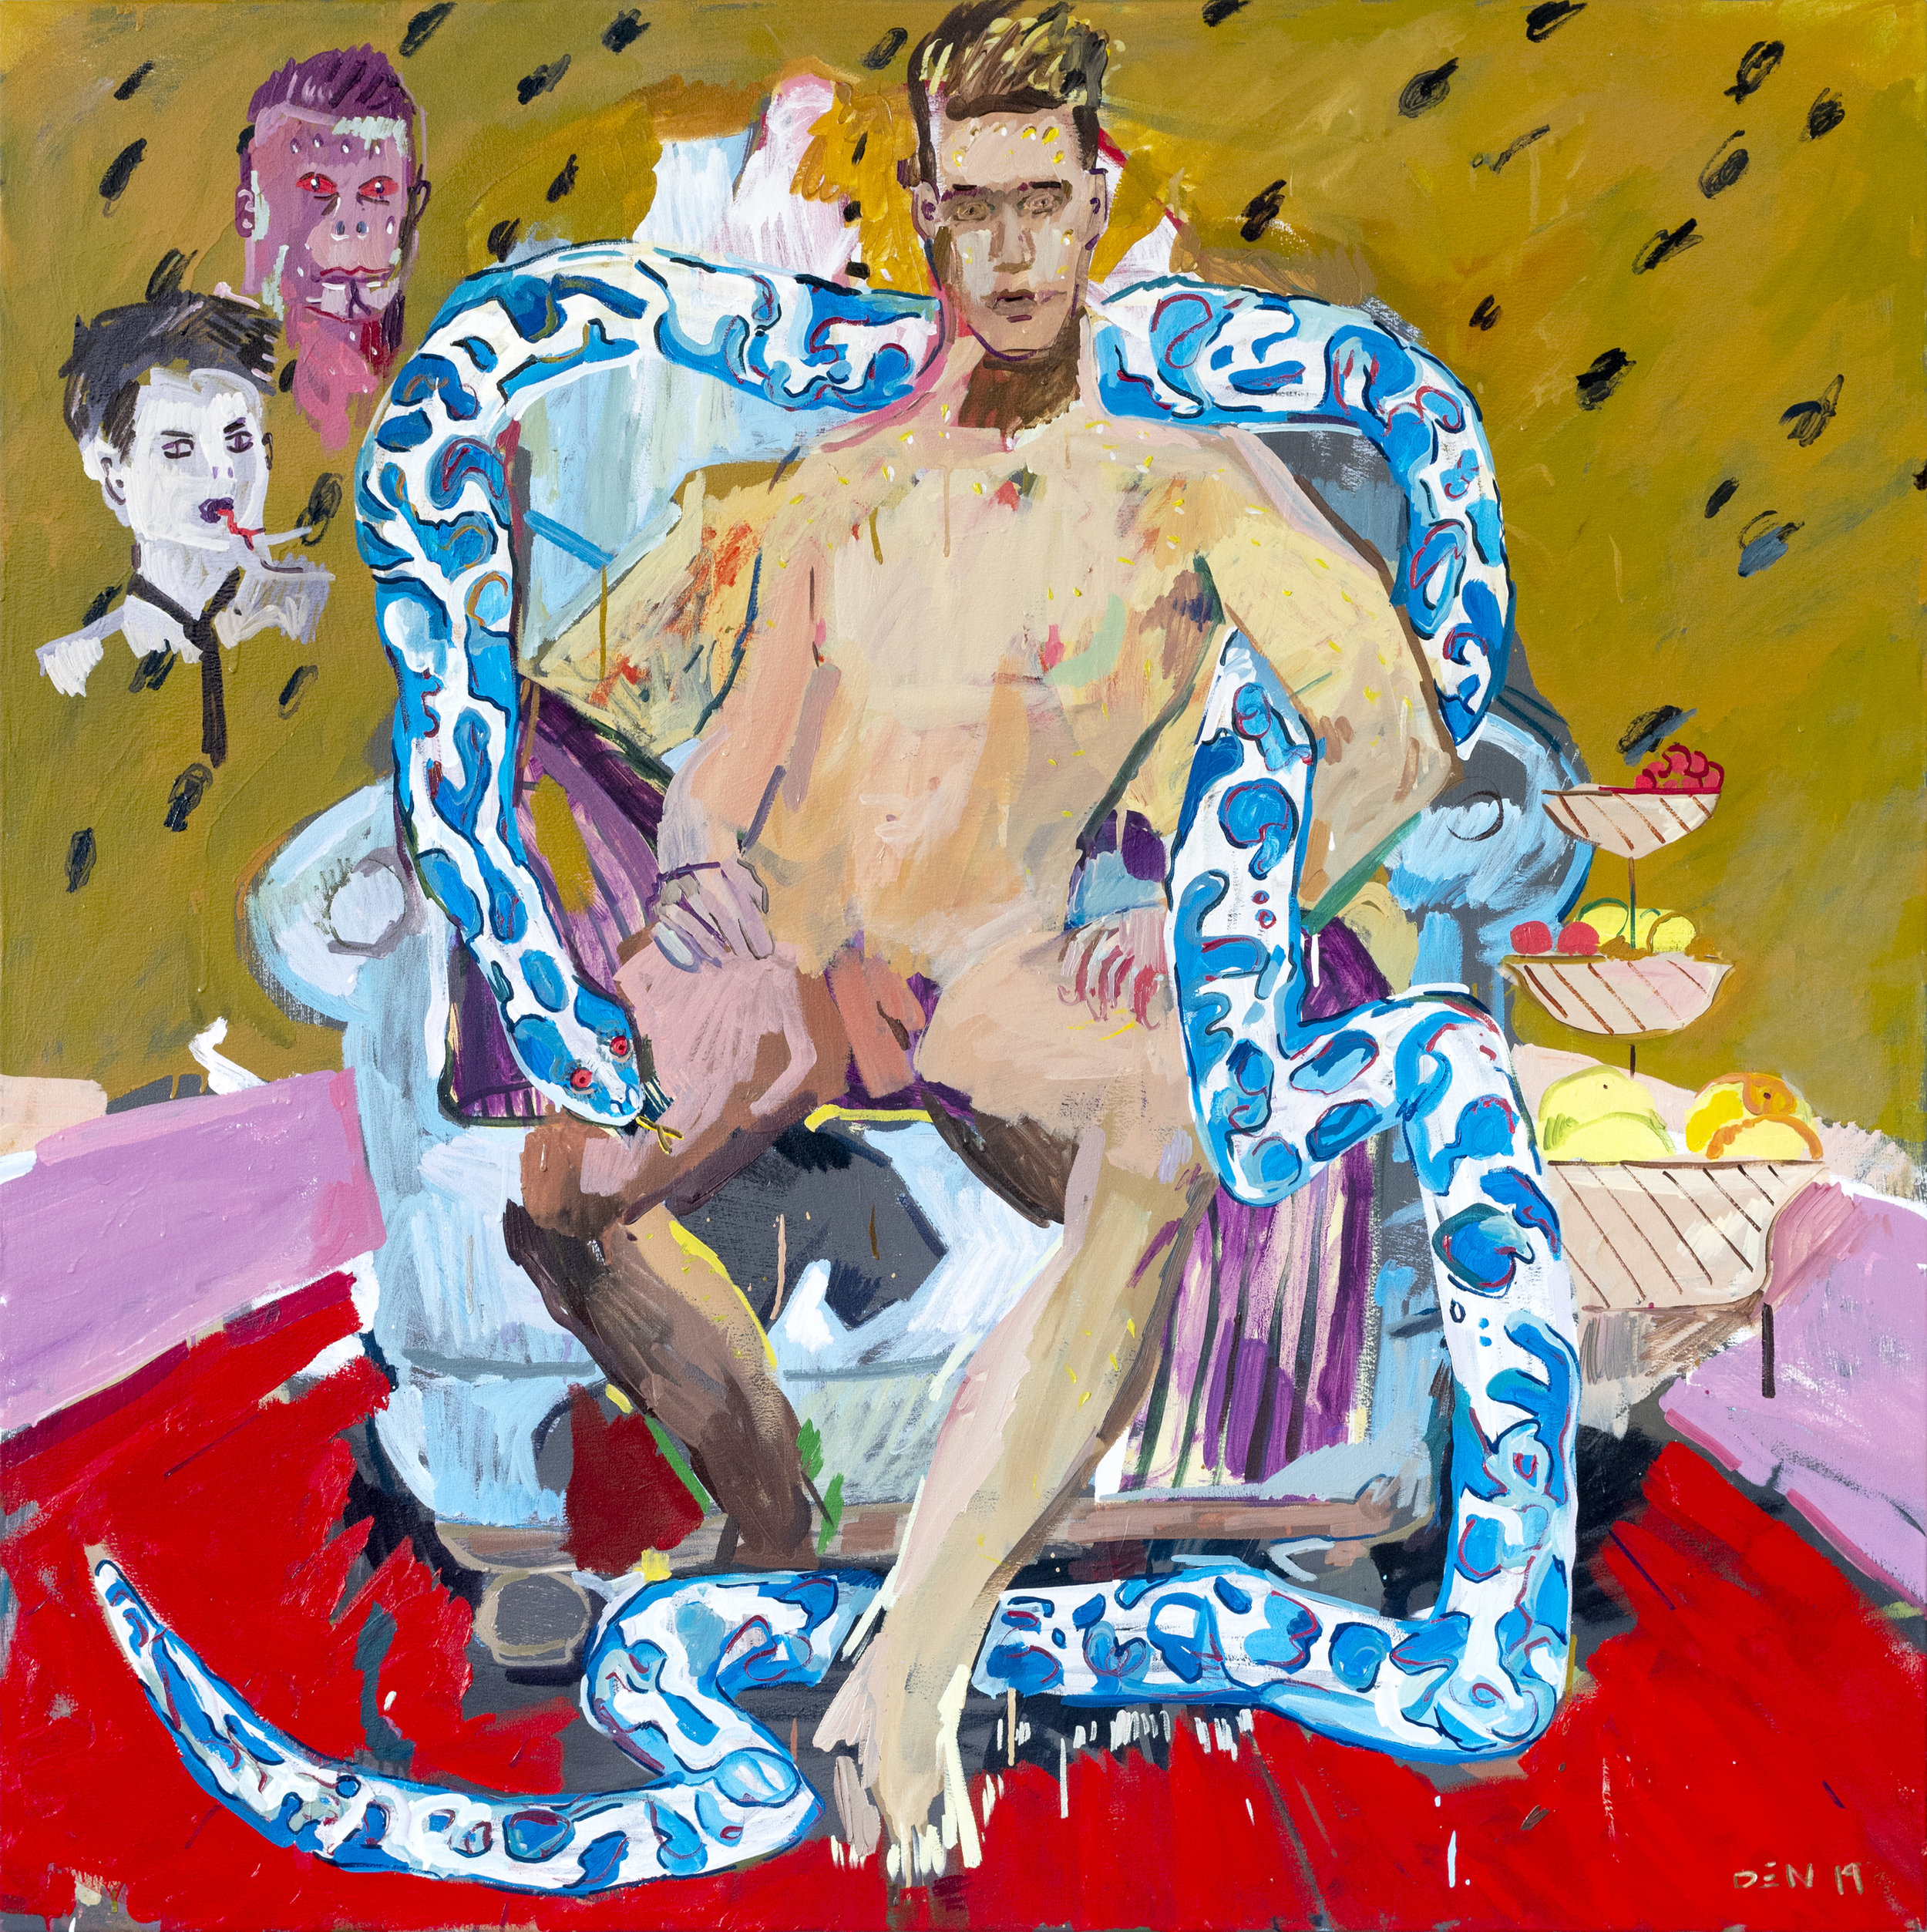 Snake Pit, 2019, Oil on Canvas, 140cm x 140cm